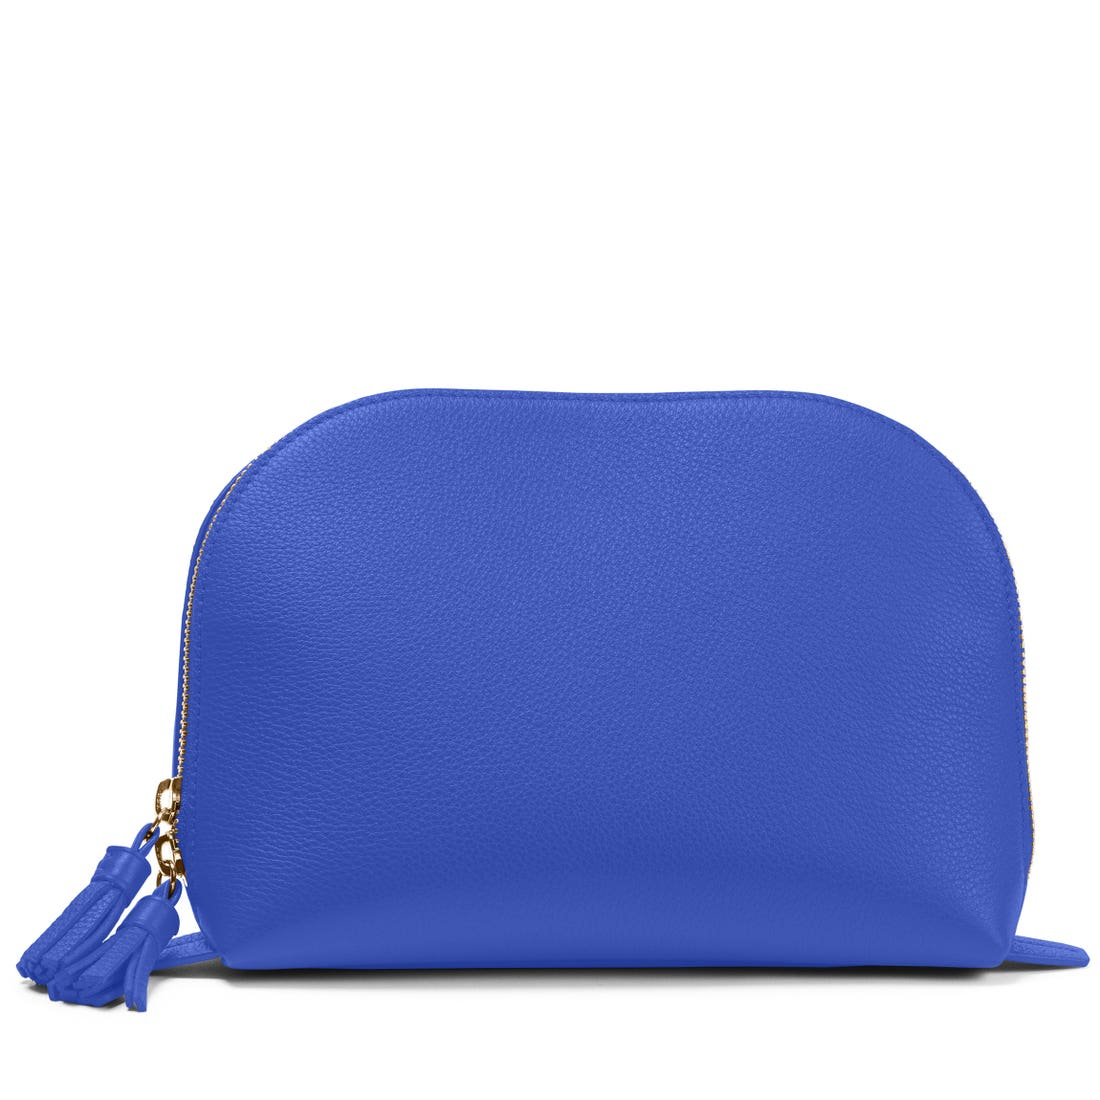 Large Clamshell Makeup Bag